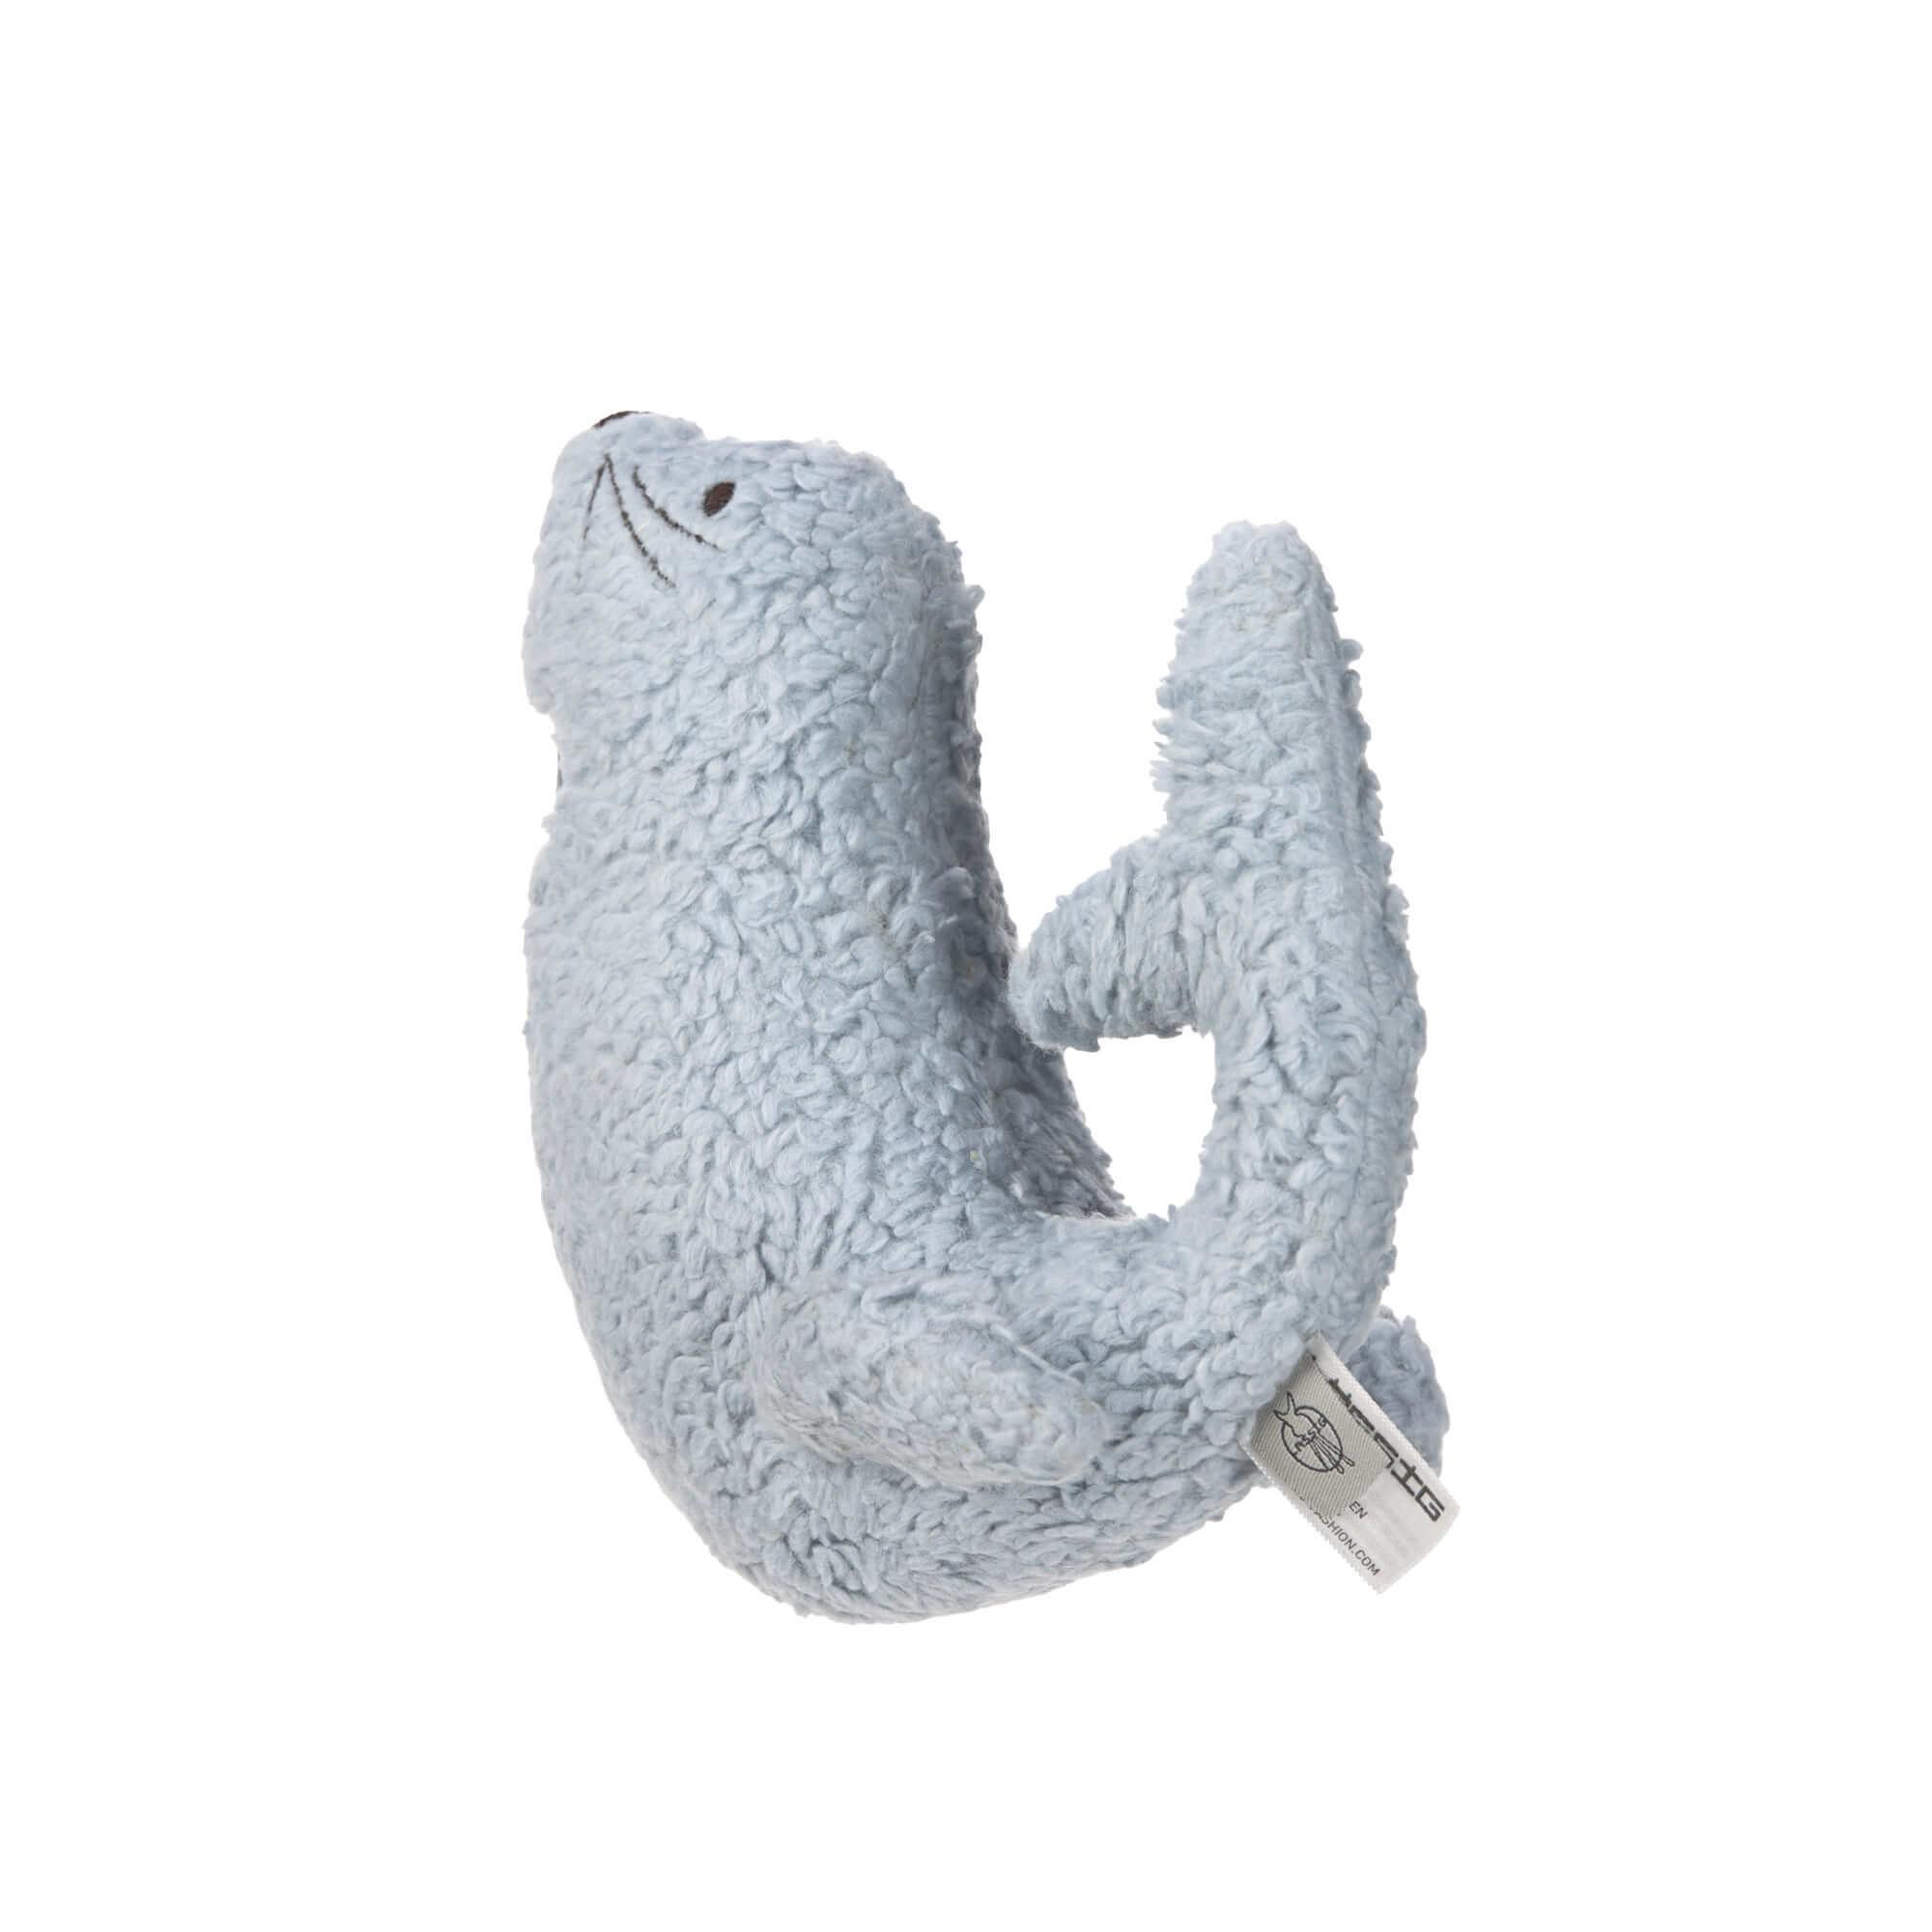 Lässig Lässig gebreid speeltje knuffel met rammelaar knetter More Magic Seal